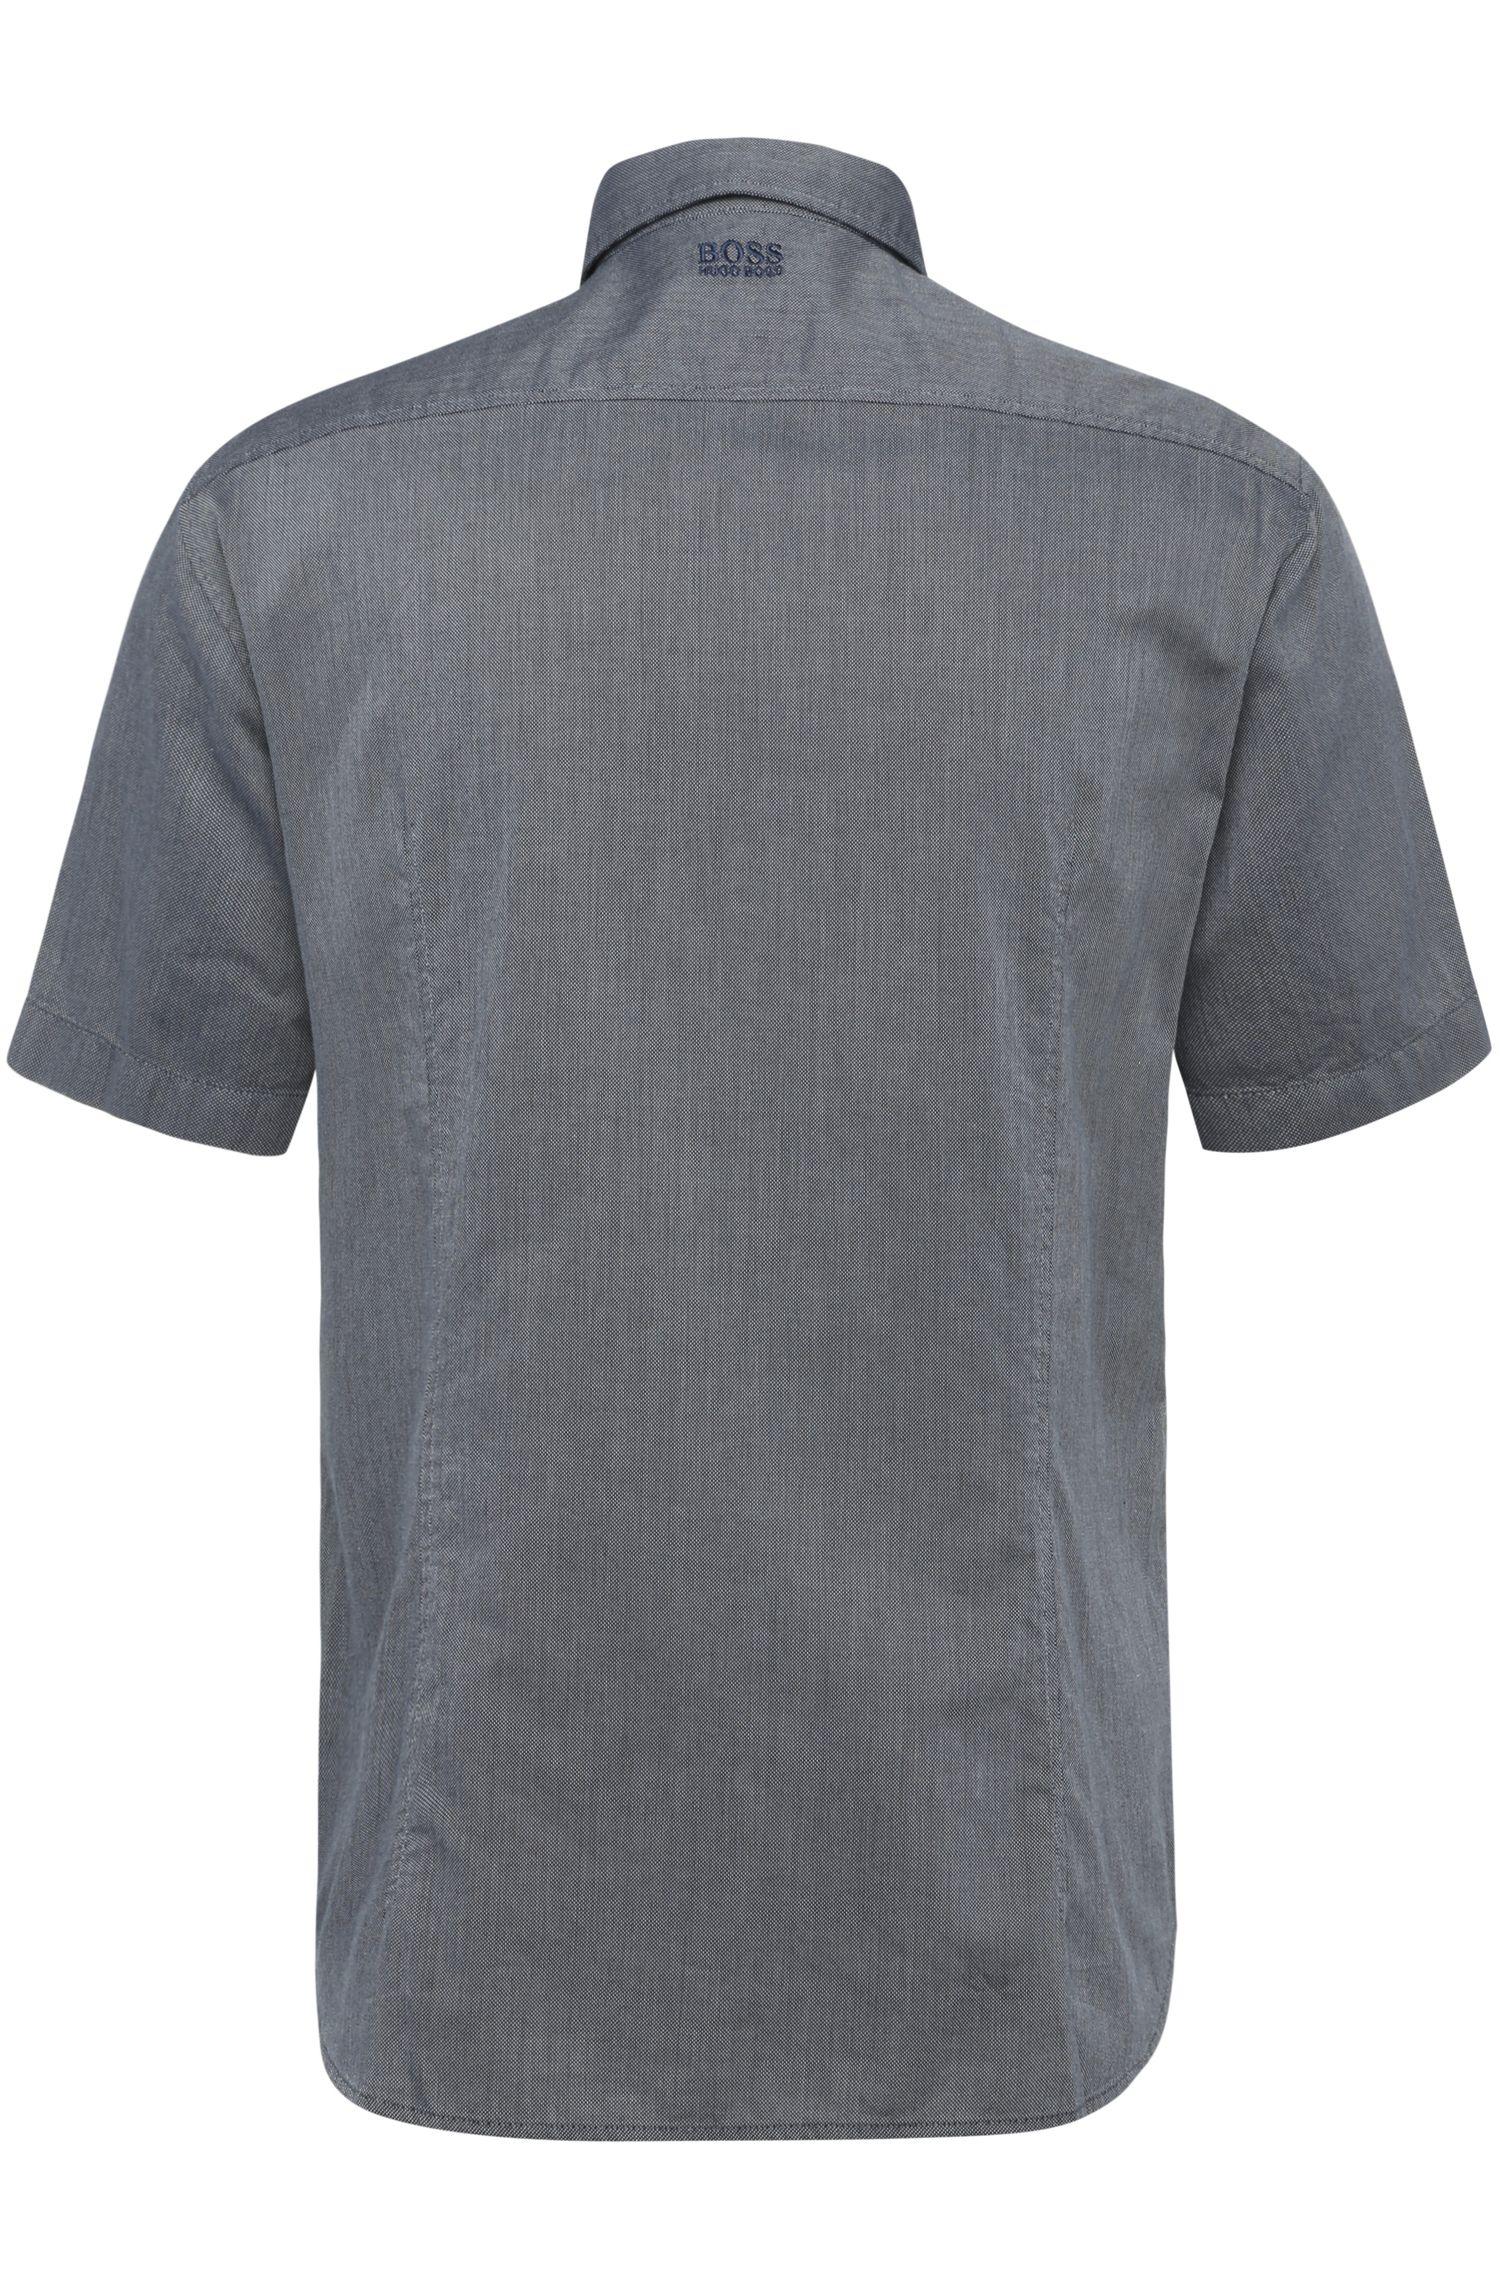 Regular-Fit Kurzarm-Hemd aus texturierter Baumwolle: ´Barbatino`